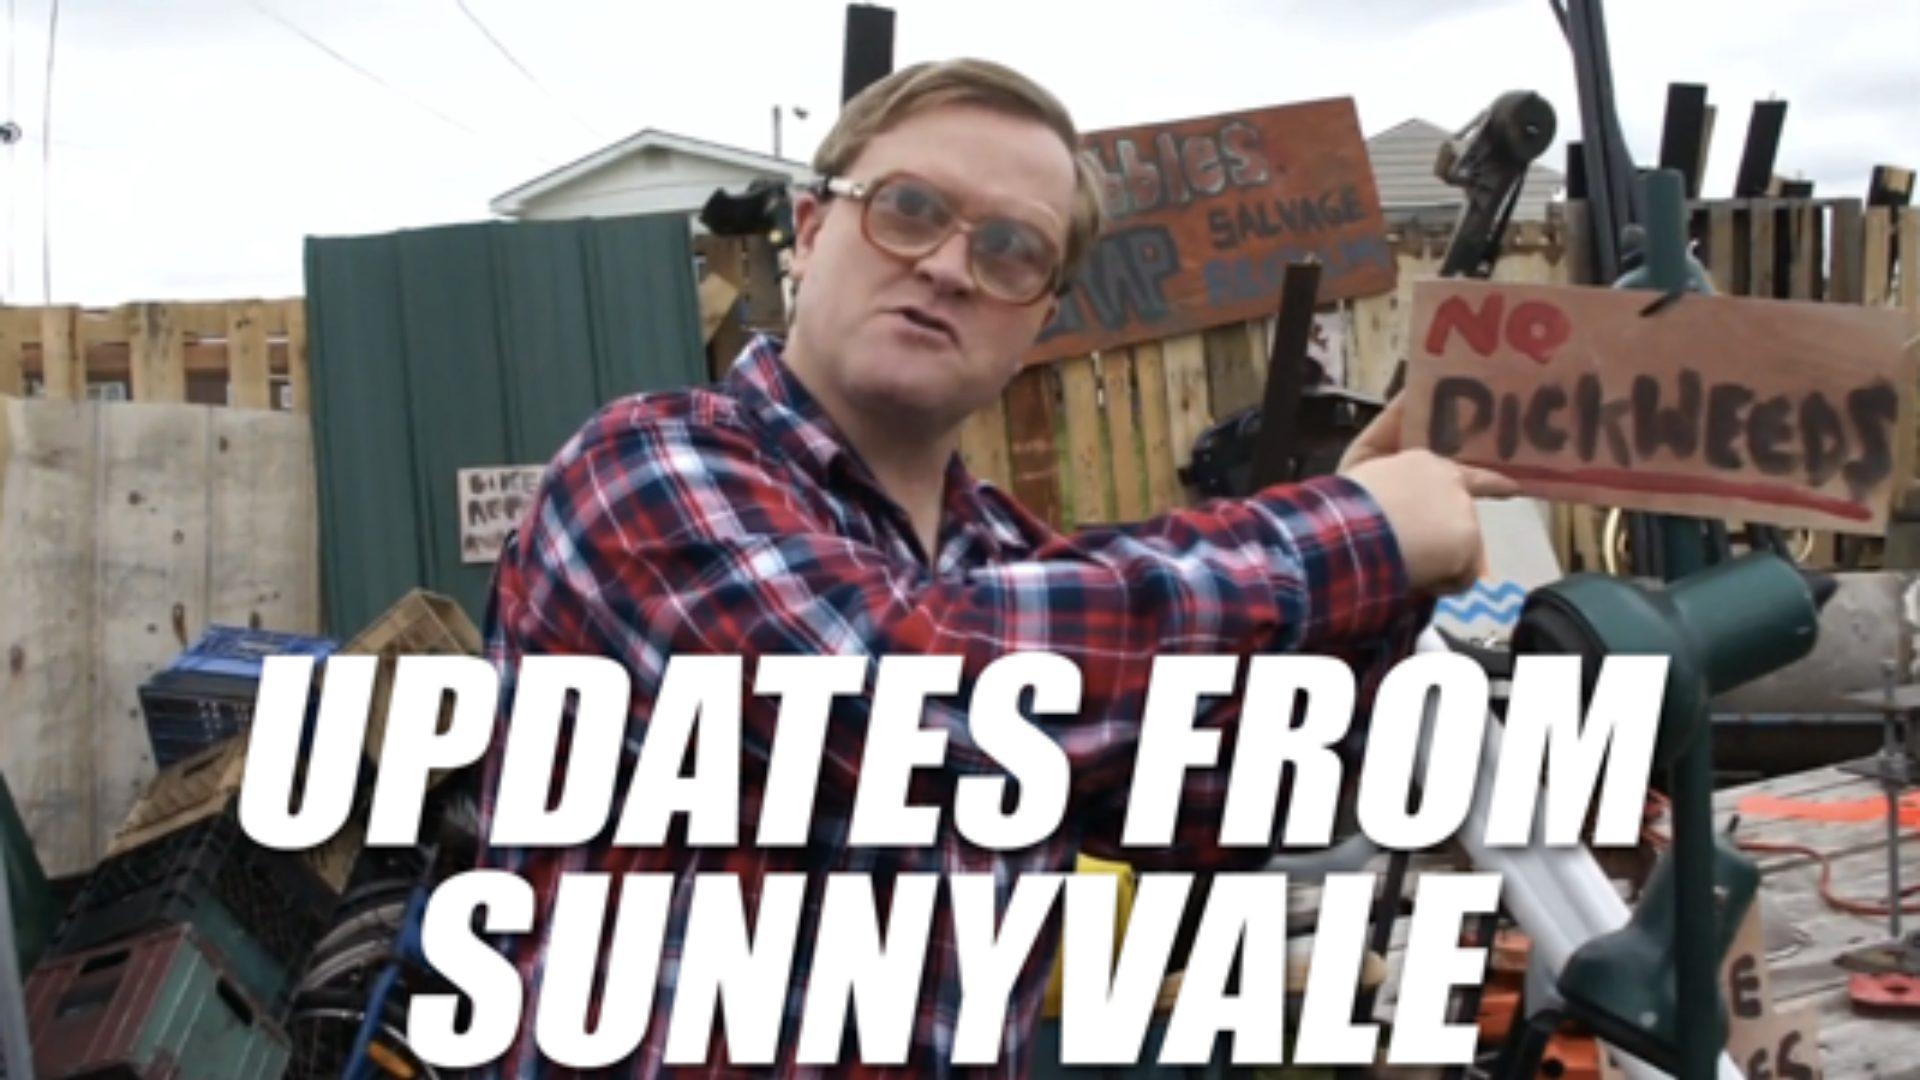 Trailer Park Boys Updates From Sunnyvale Swearnet